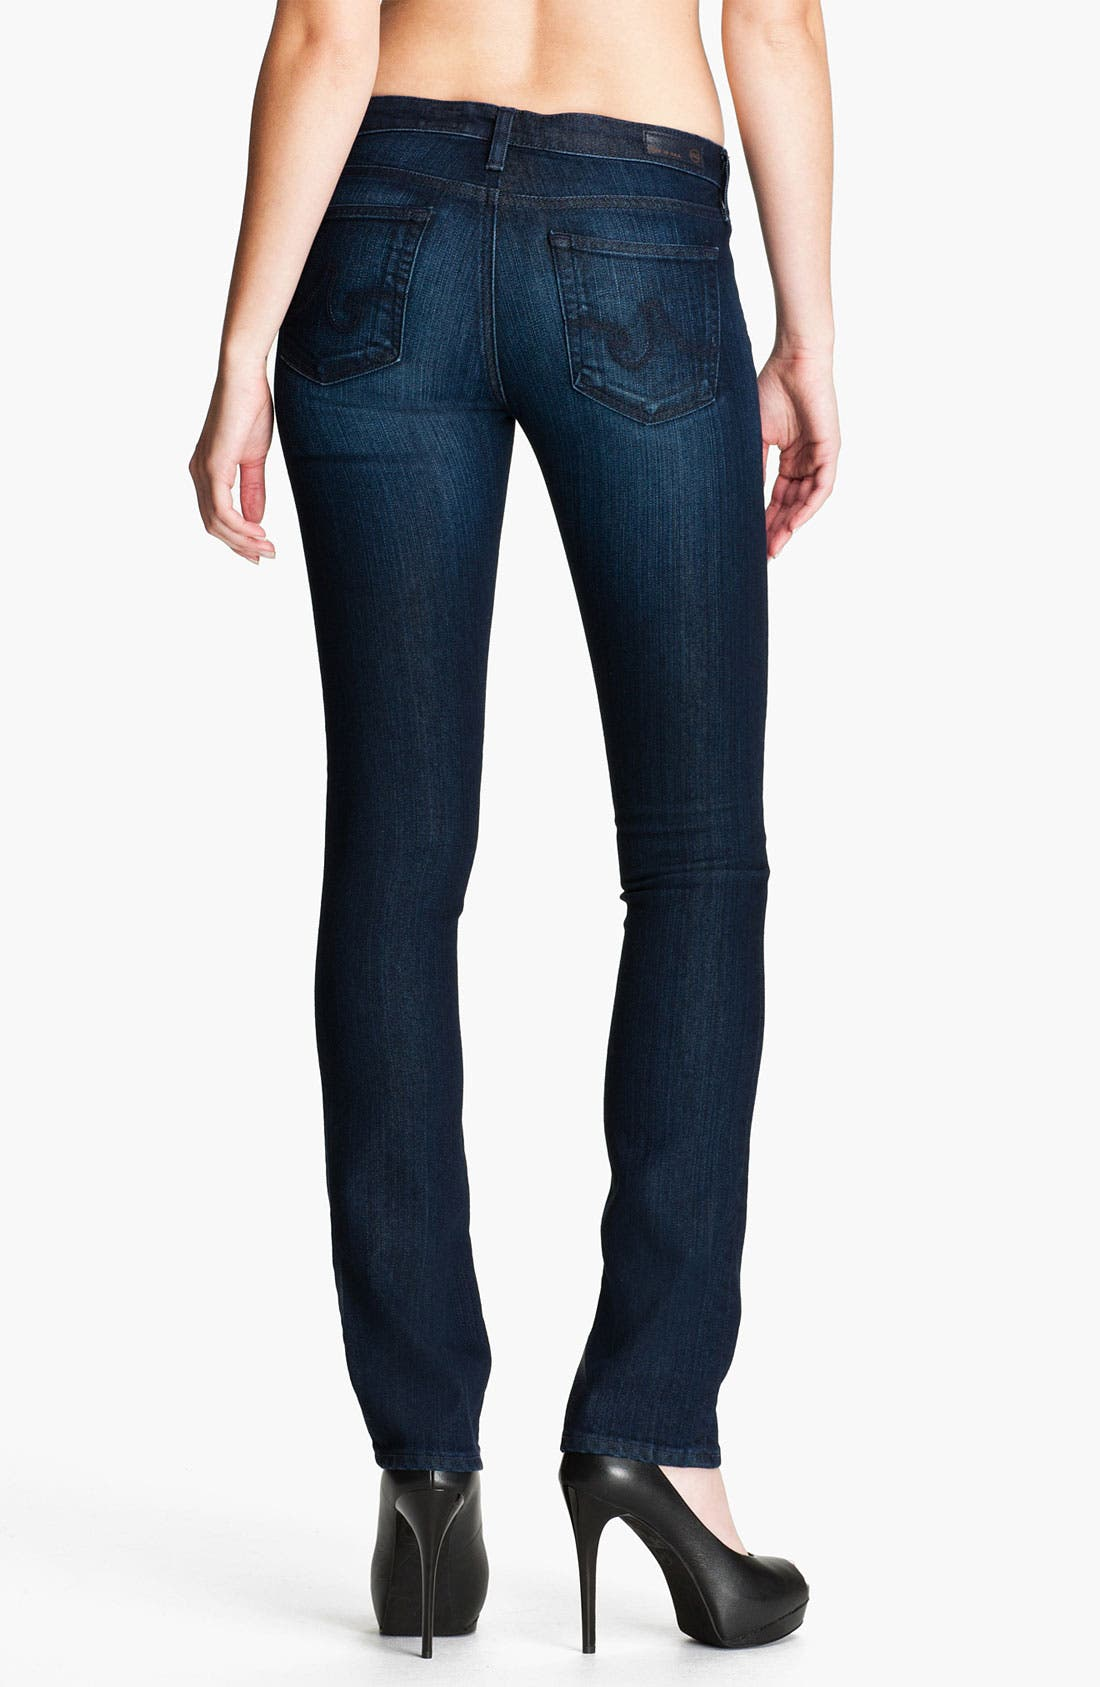 Alternate Image 2  - AG Jeans 'Ballad' Slim Bootcut Stretch Jeans (Viy Vision)